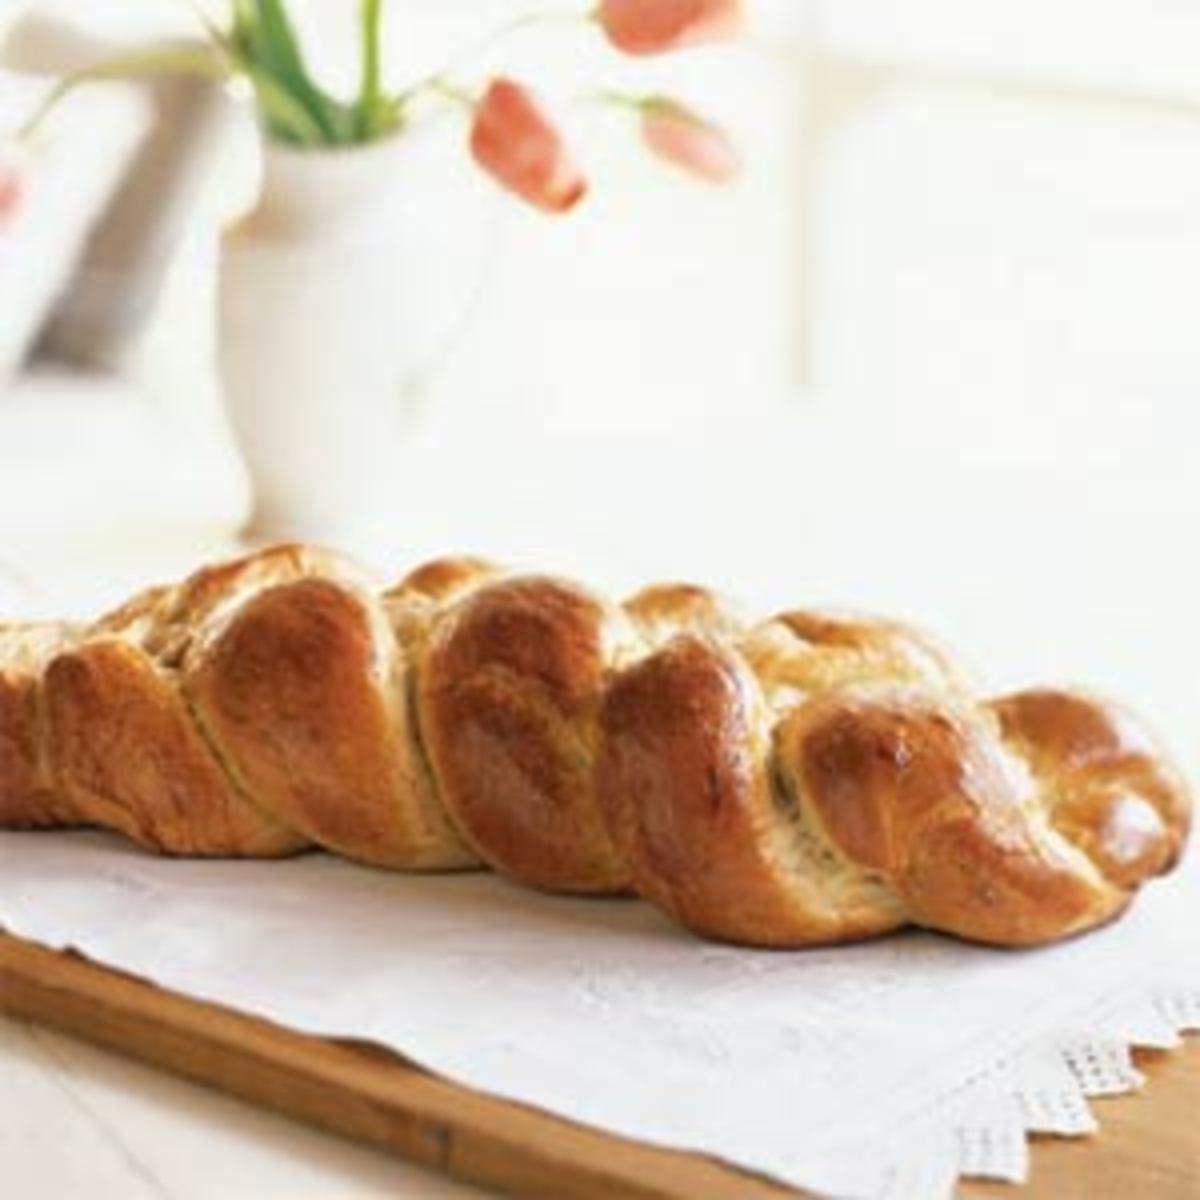 http://find.myrecipes.com/recipes/recipefinder.dyn?action=displayRecipe&recipe_id=1031632